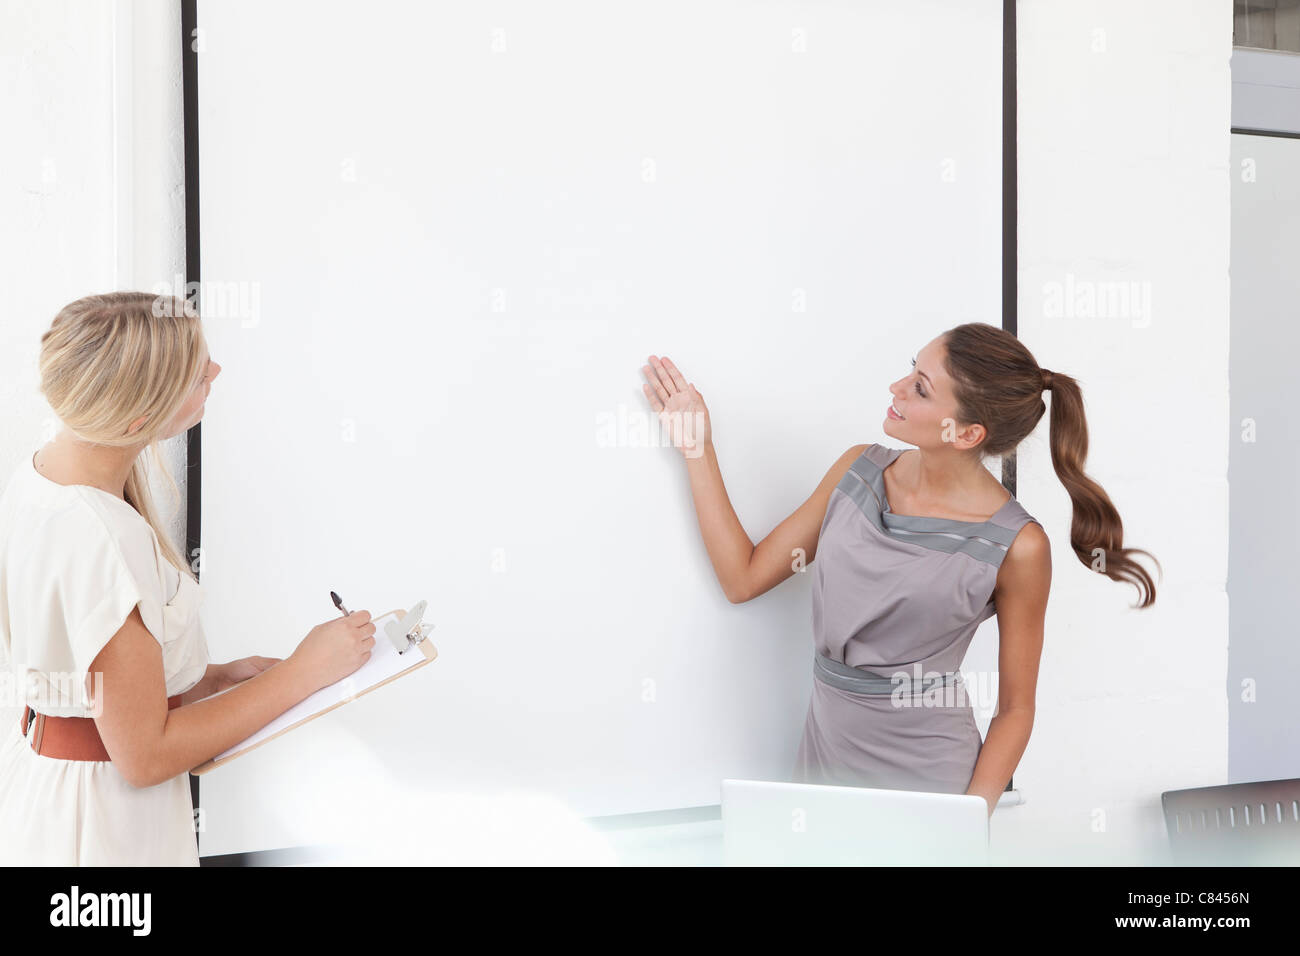 Businesswomen examining screen in office - Stock Image